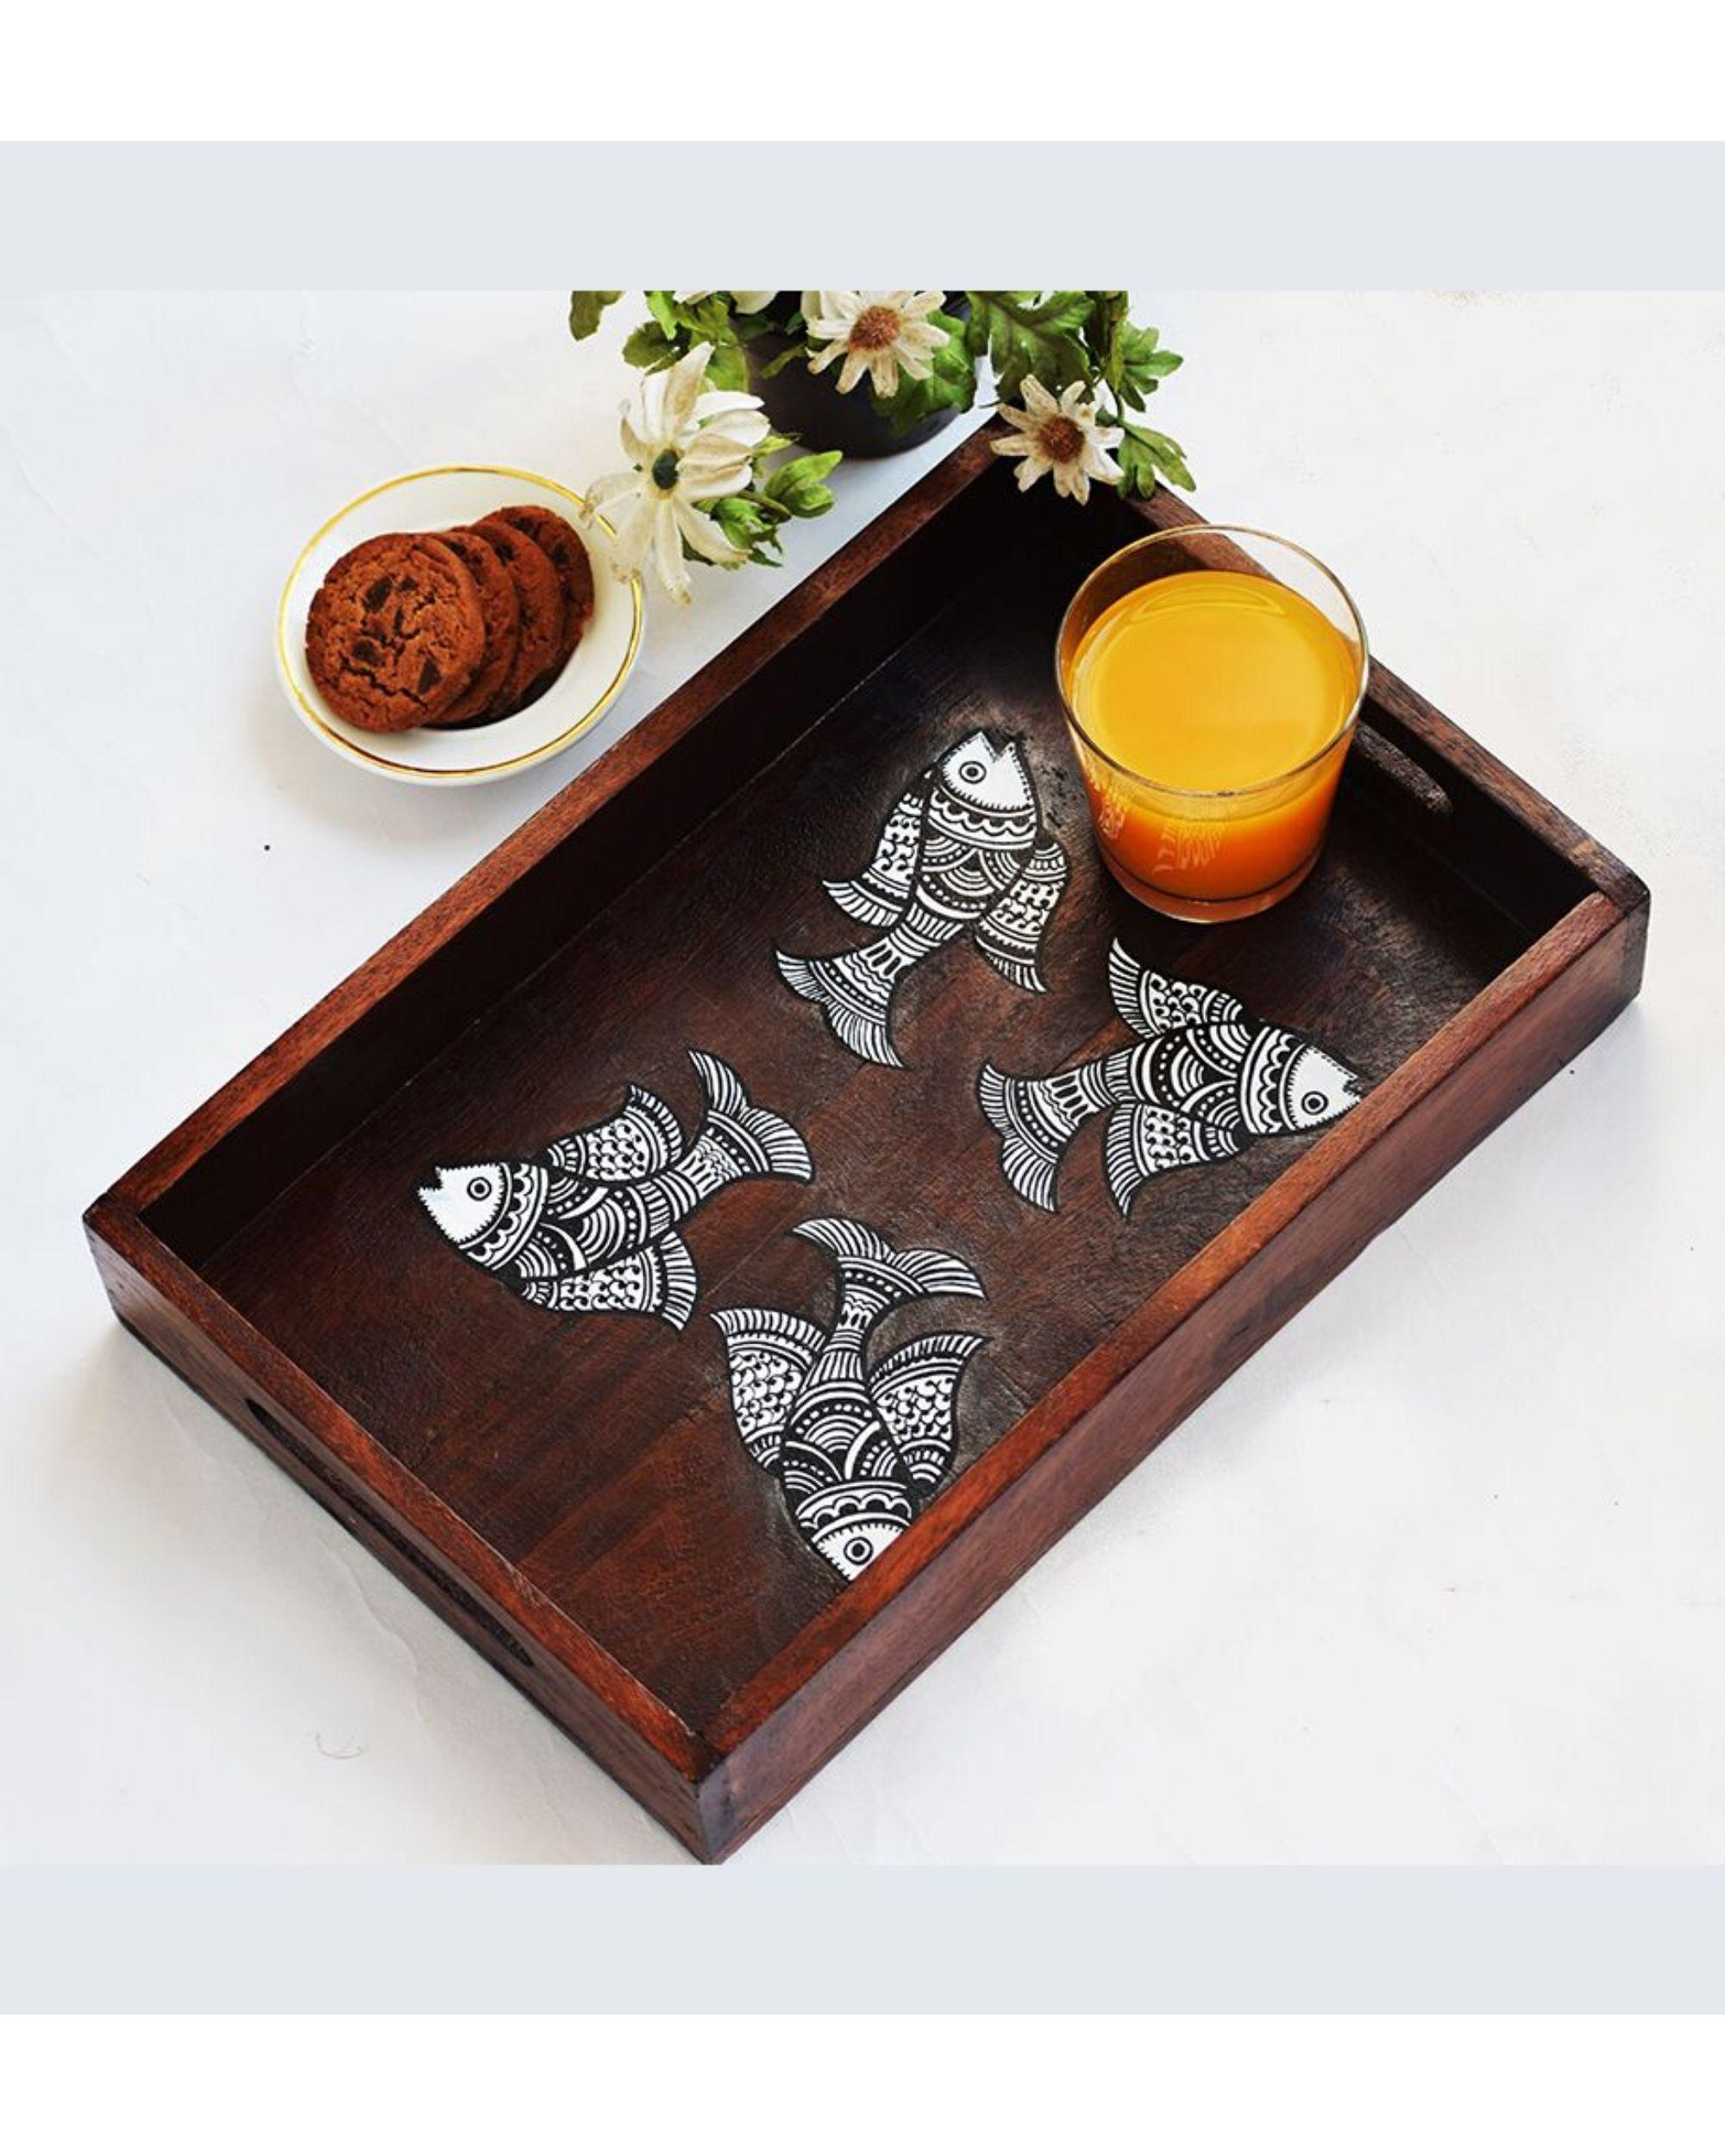 Hand painted madhubani fish tray